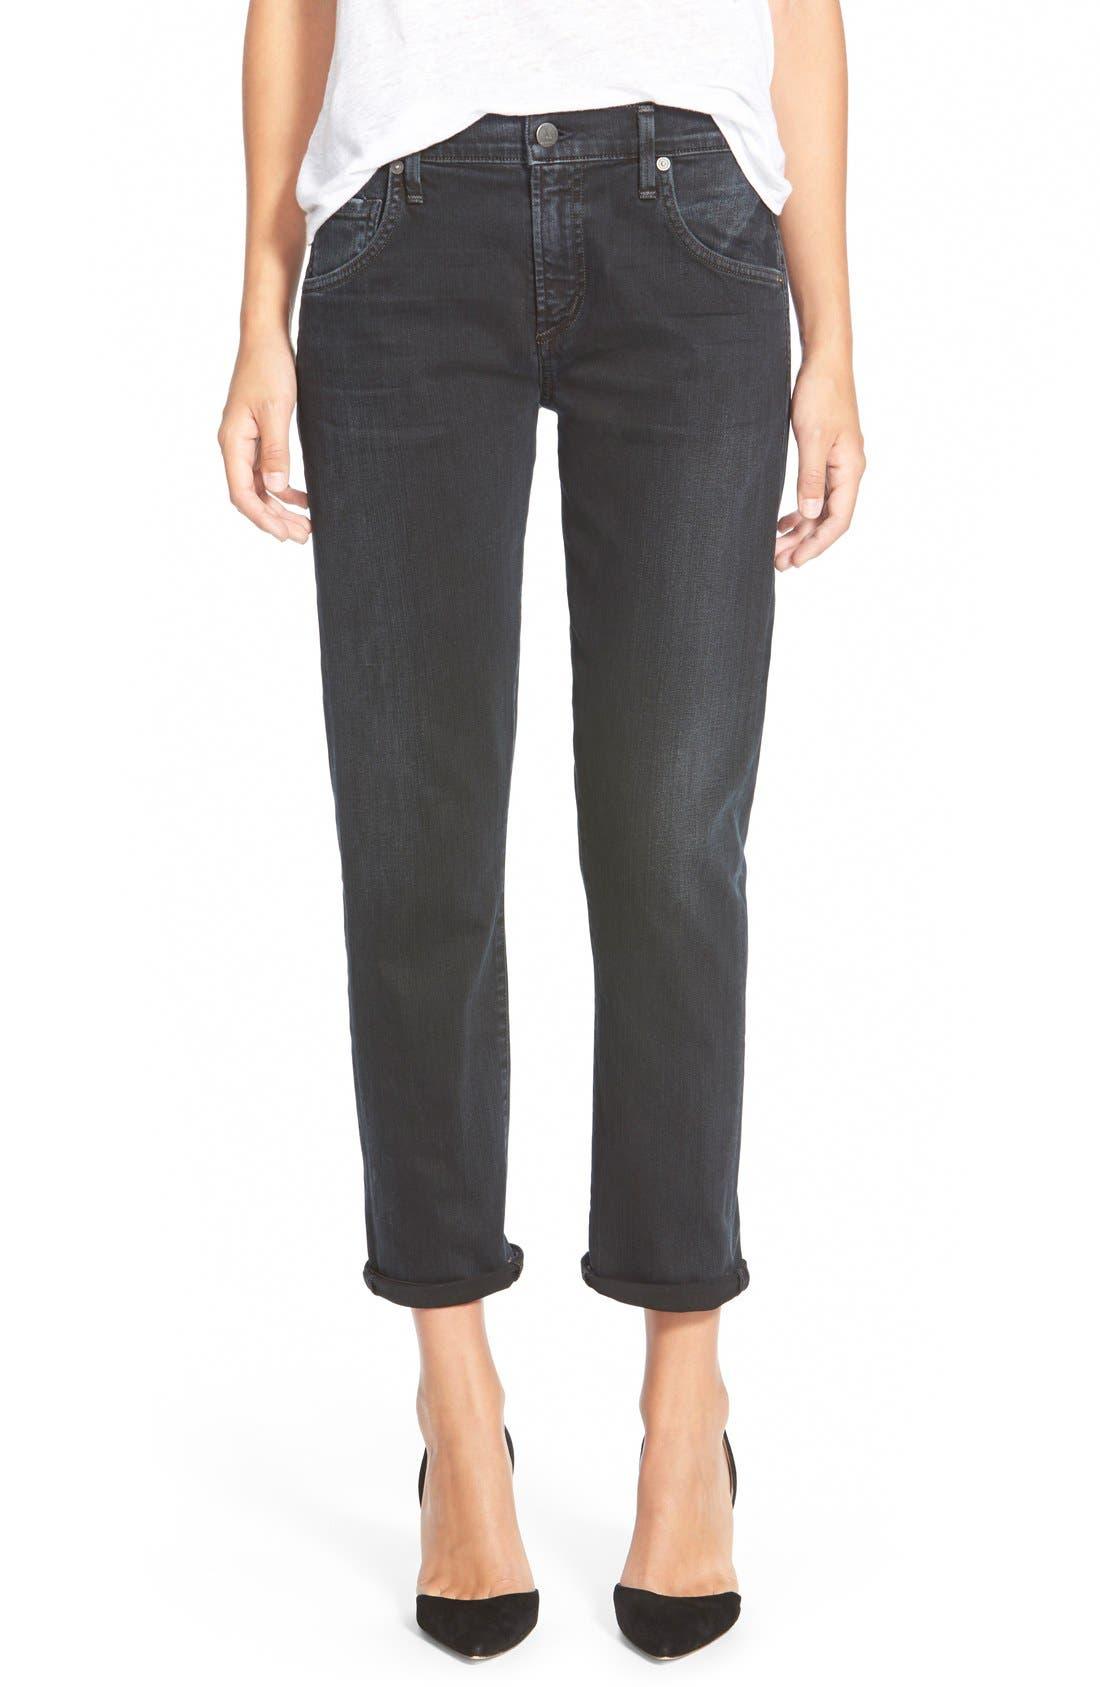 Emerson High Waist Boyfriend Slim Jeans,                         Main,                         color, Black And Blue